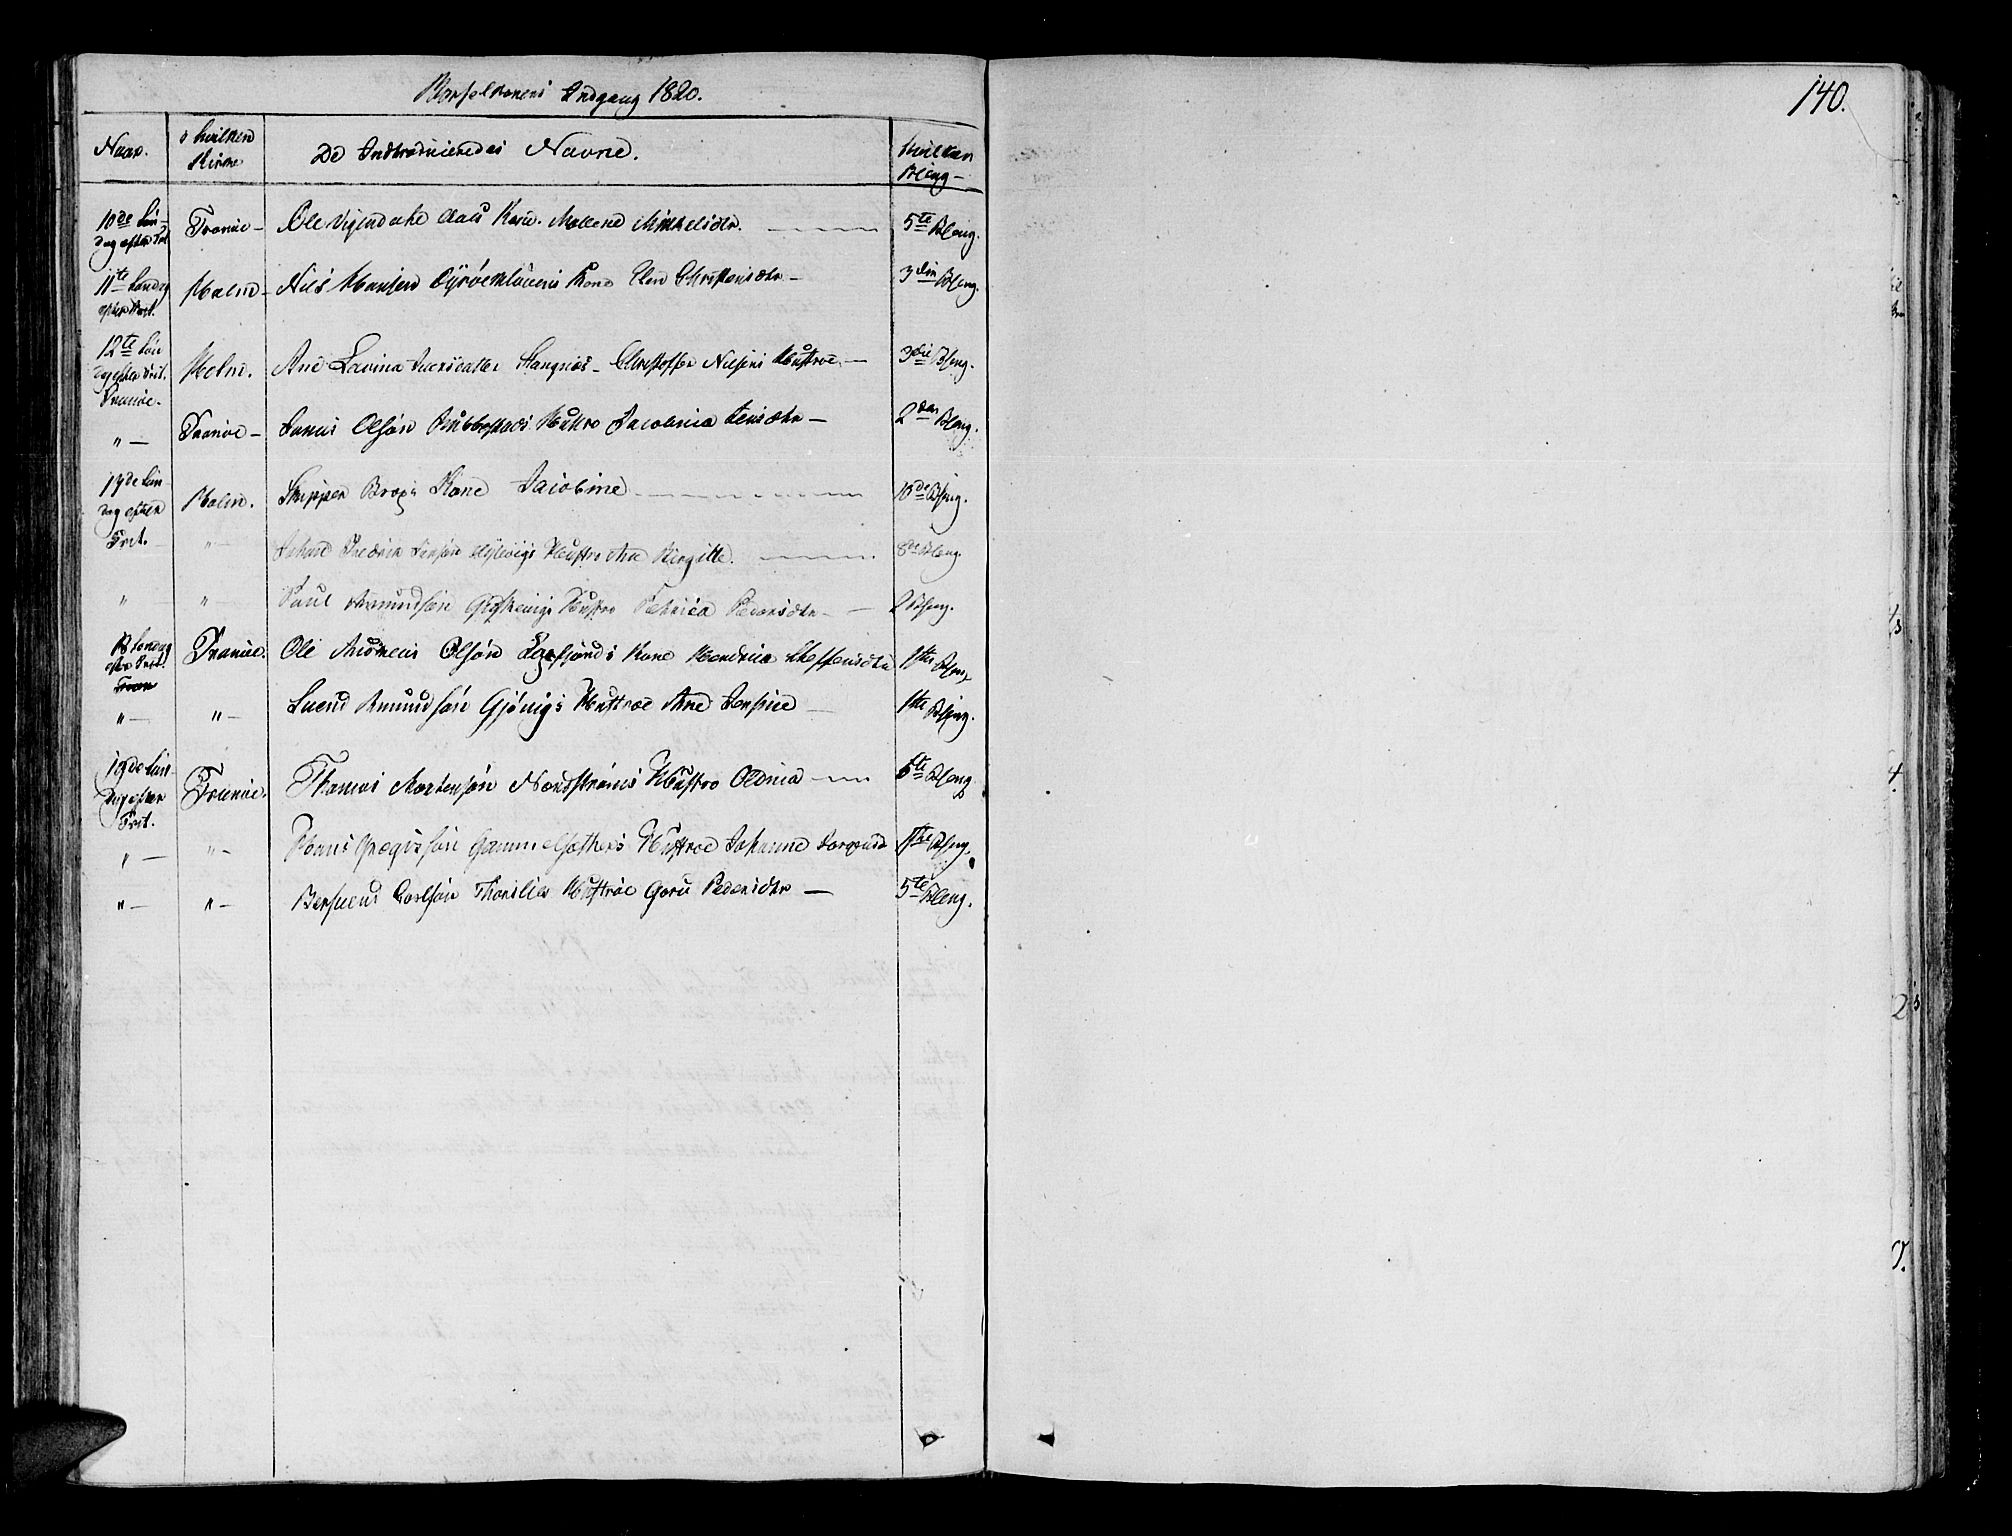 SATØ, Tranøy sokneprestkontor, I/Ia/Iaa/L0003kirke: Ministerialbok nr. 3, 1807-1820, s. 128